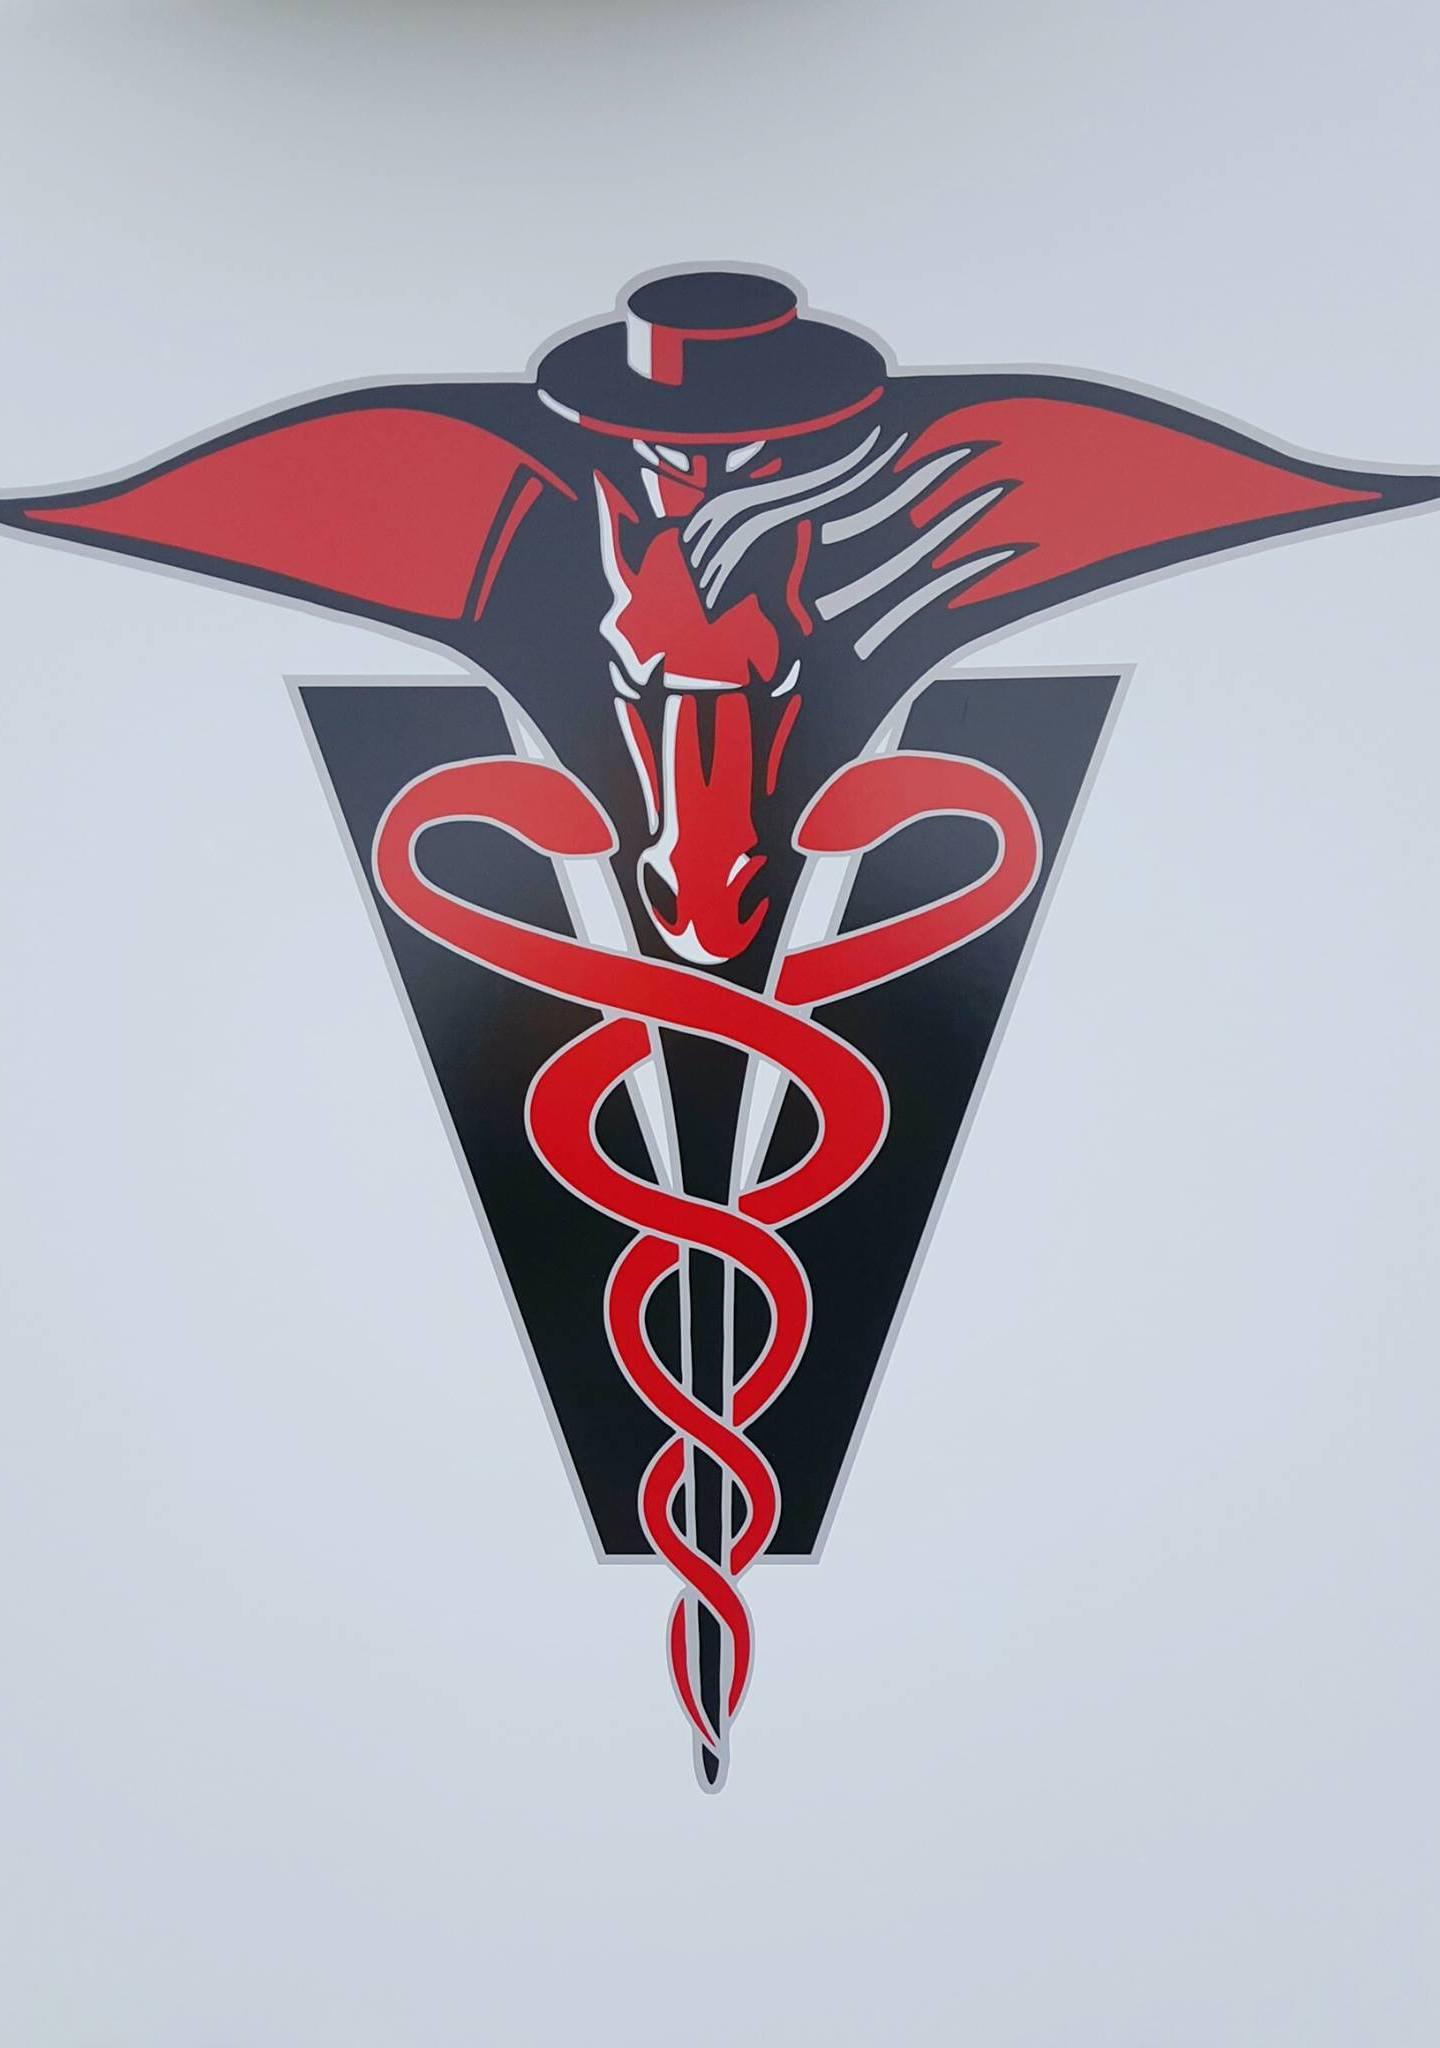 Texas Tech Vet School Logo Vertical_1495939635301-60170200.jpg